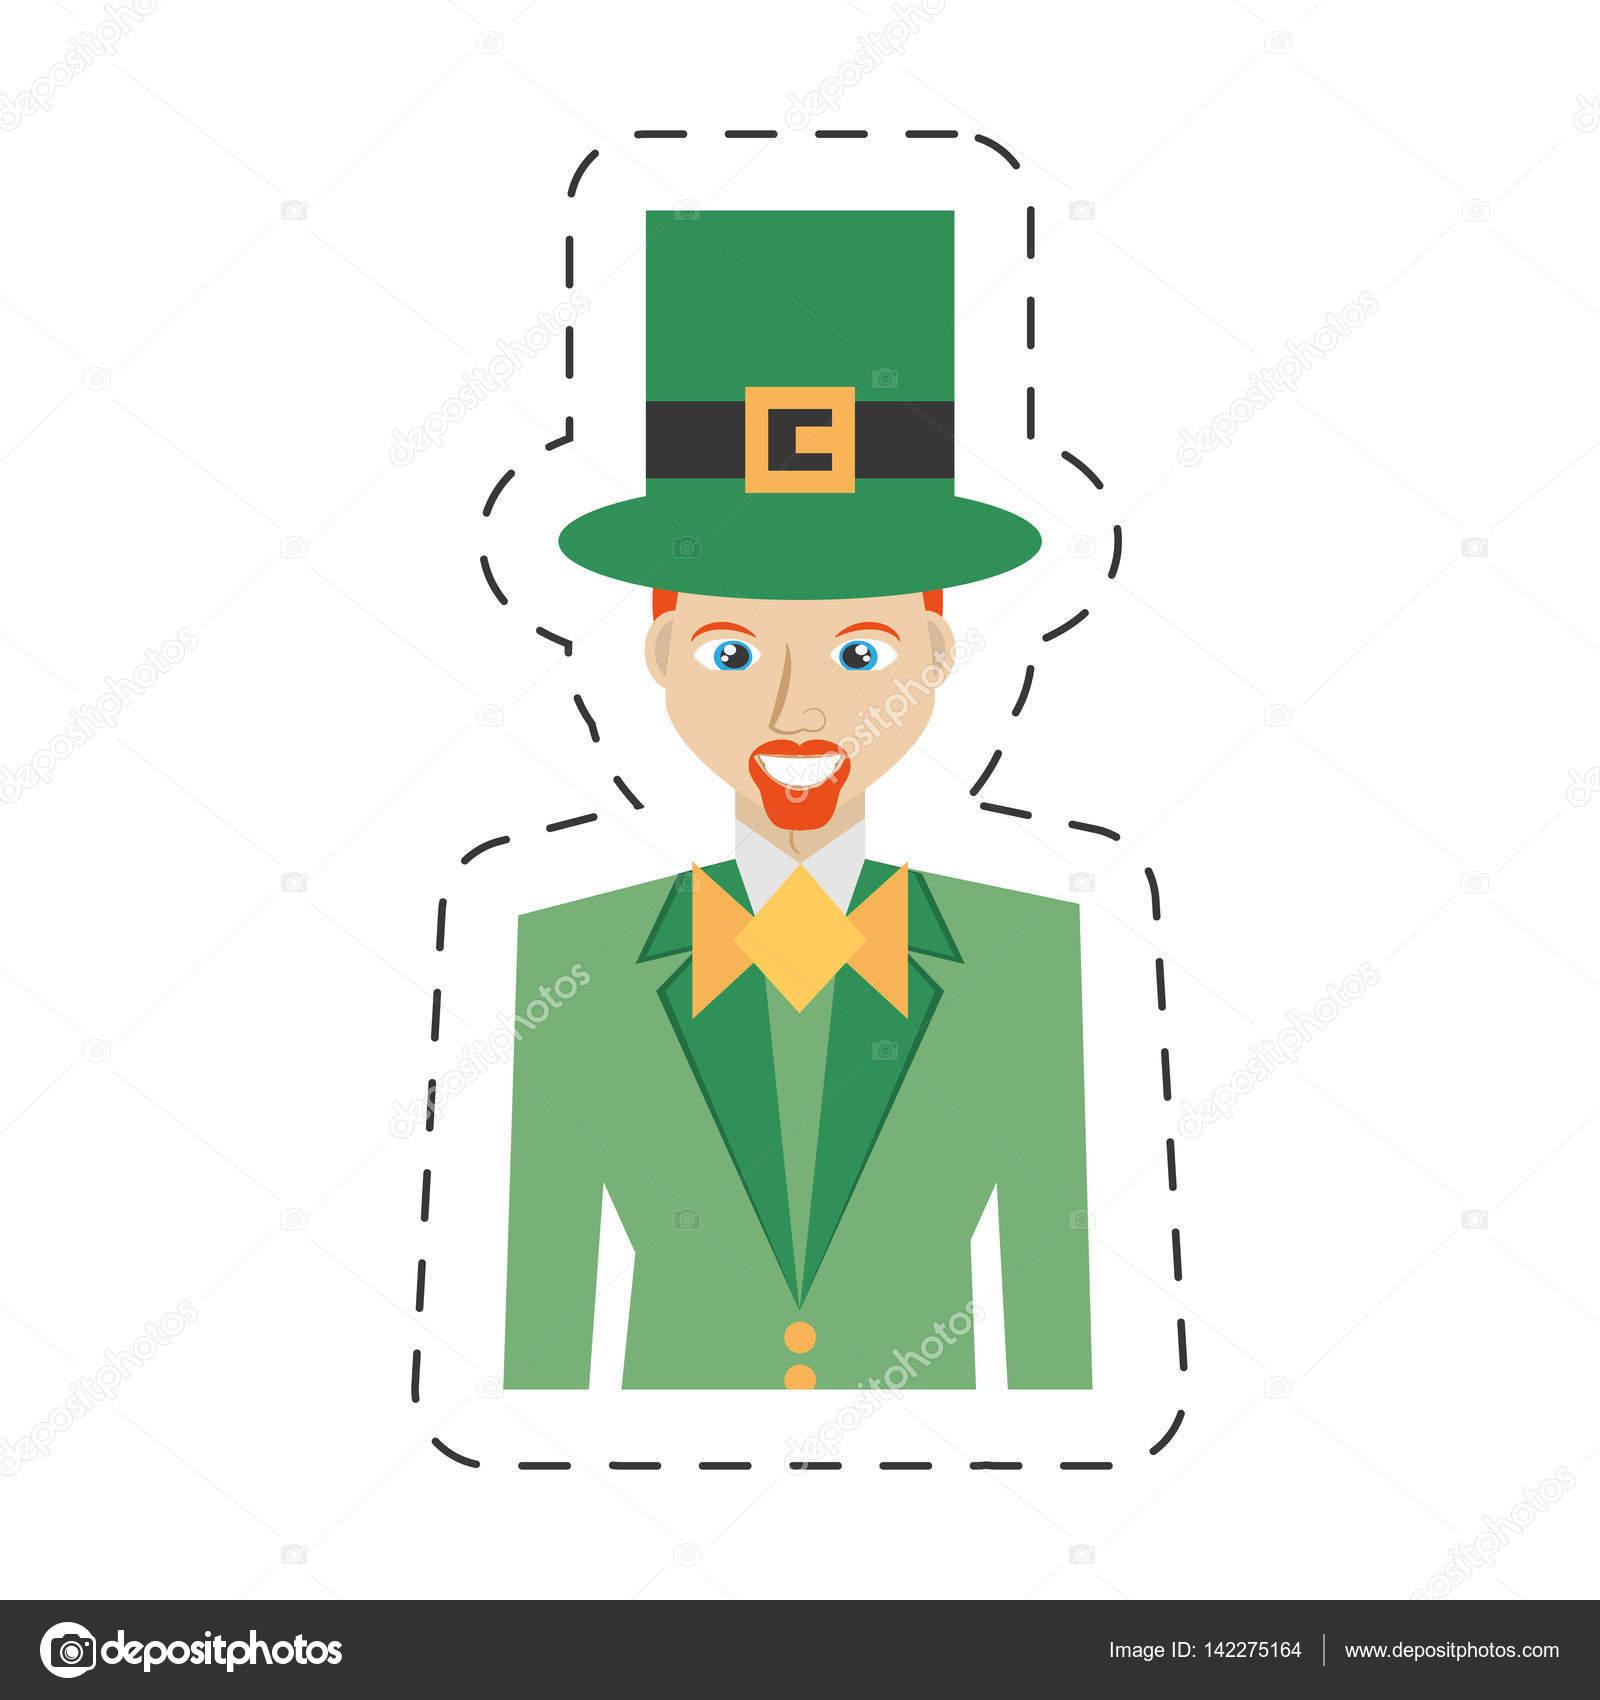 Bow Tie clipart leprechaun Portrait day 10 bowtie Vector